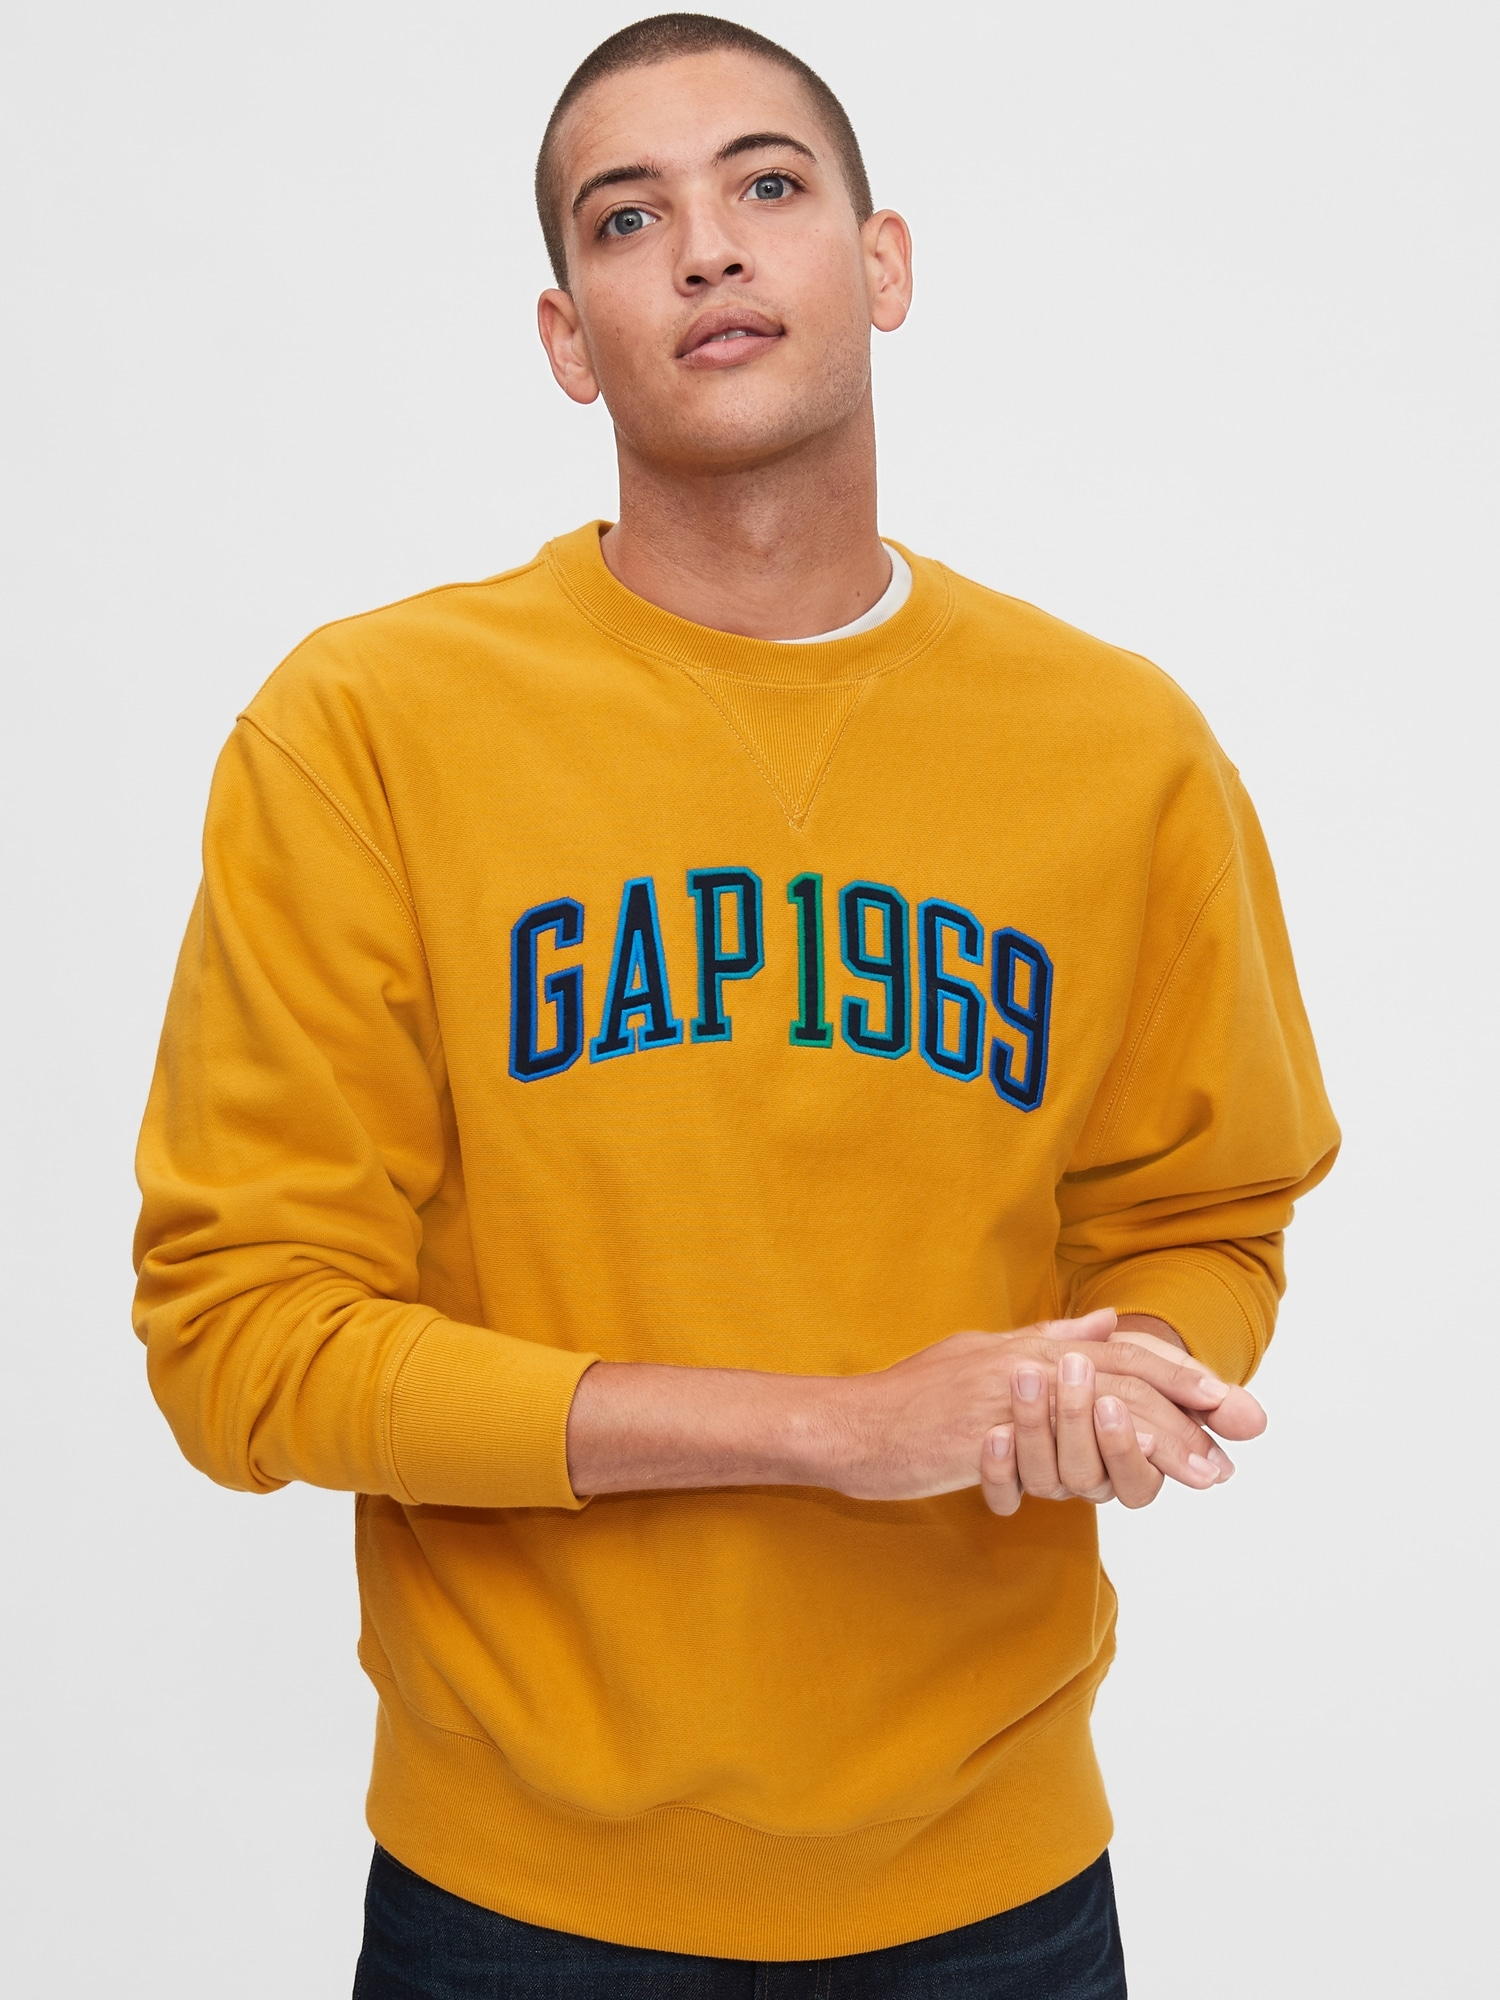 Gapロゴ クルーネックスウェットシャツ